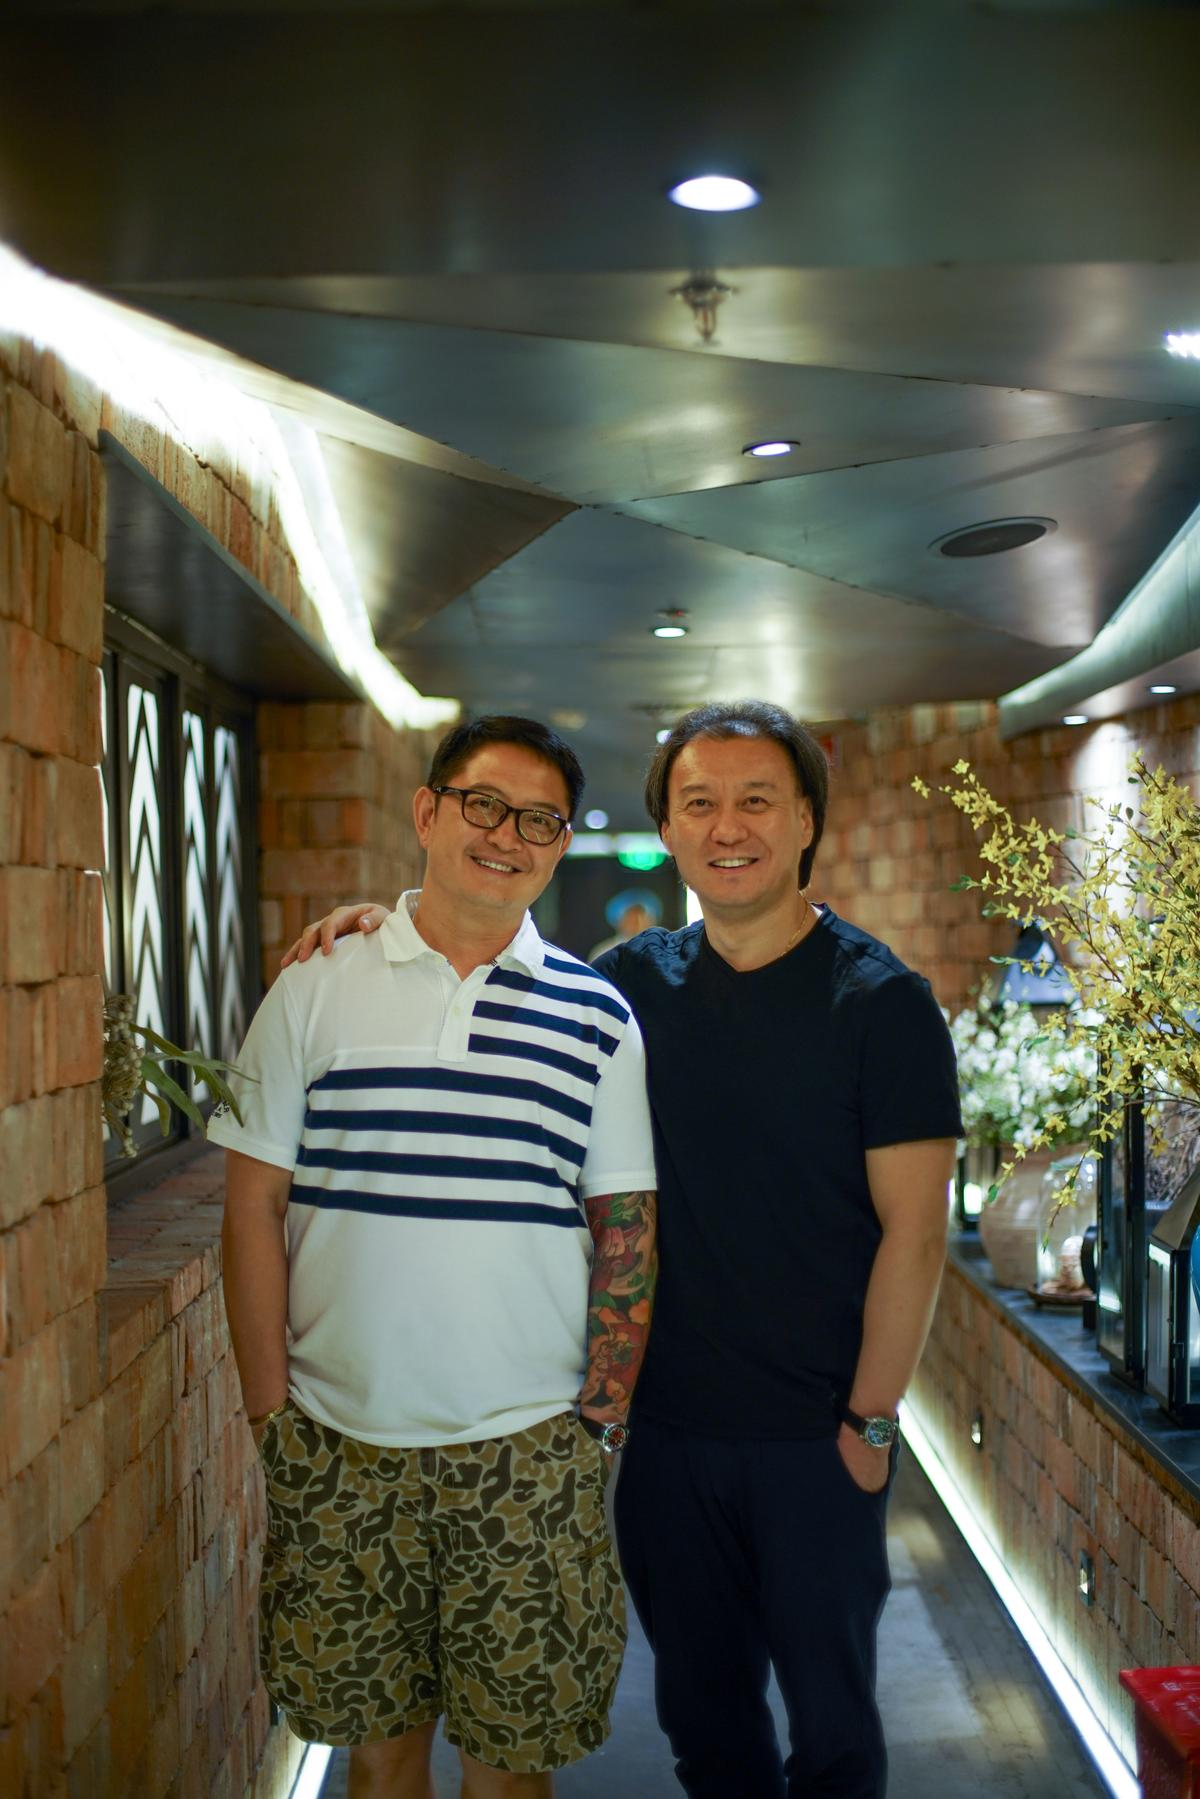 【FUN北京】從一桌私房菜起家 導演與攝影師操刀的新派中菜館